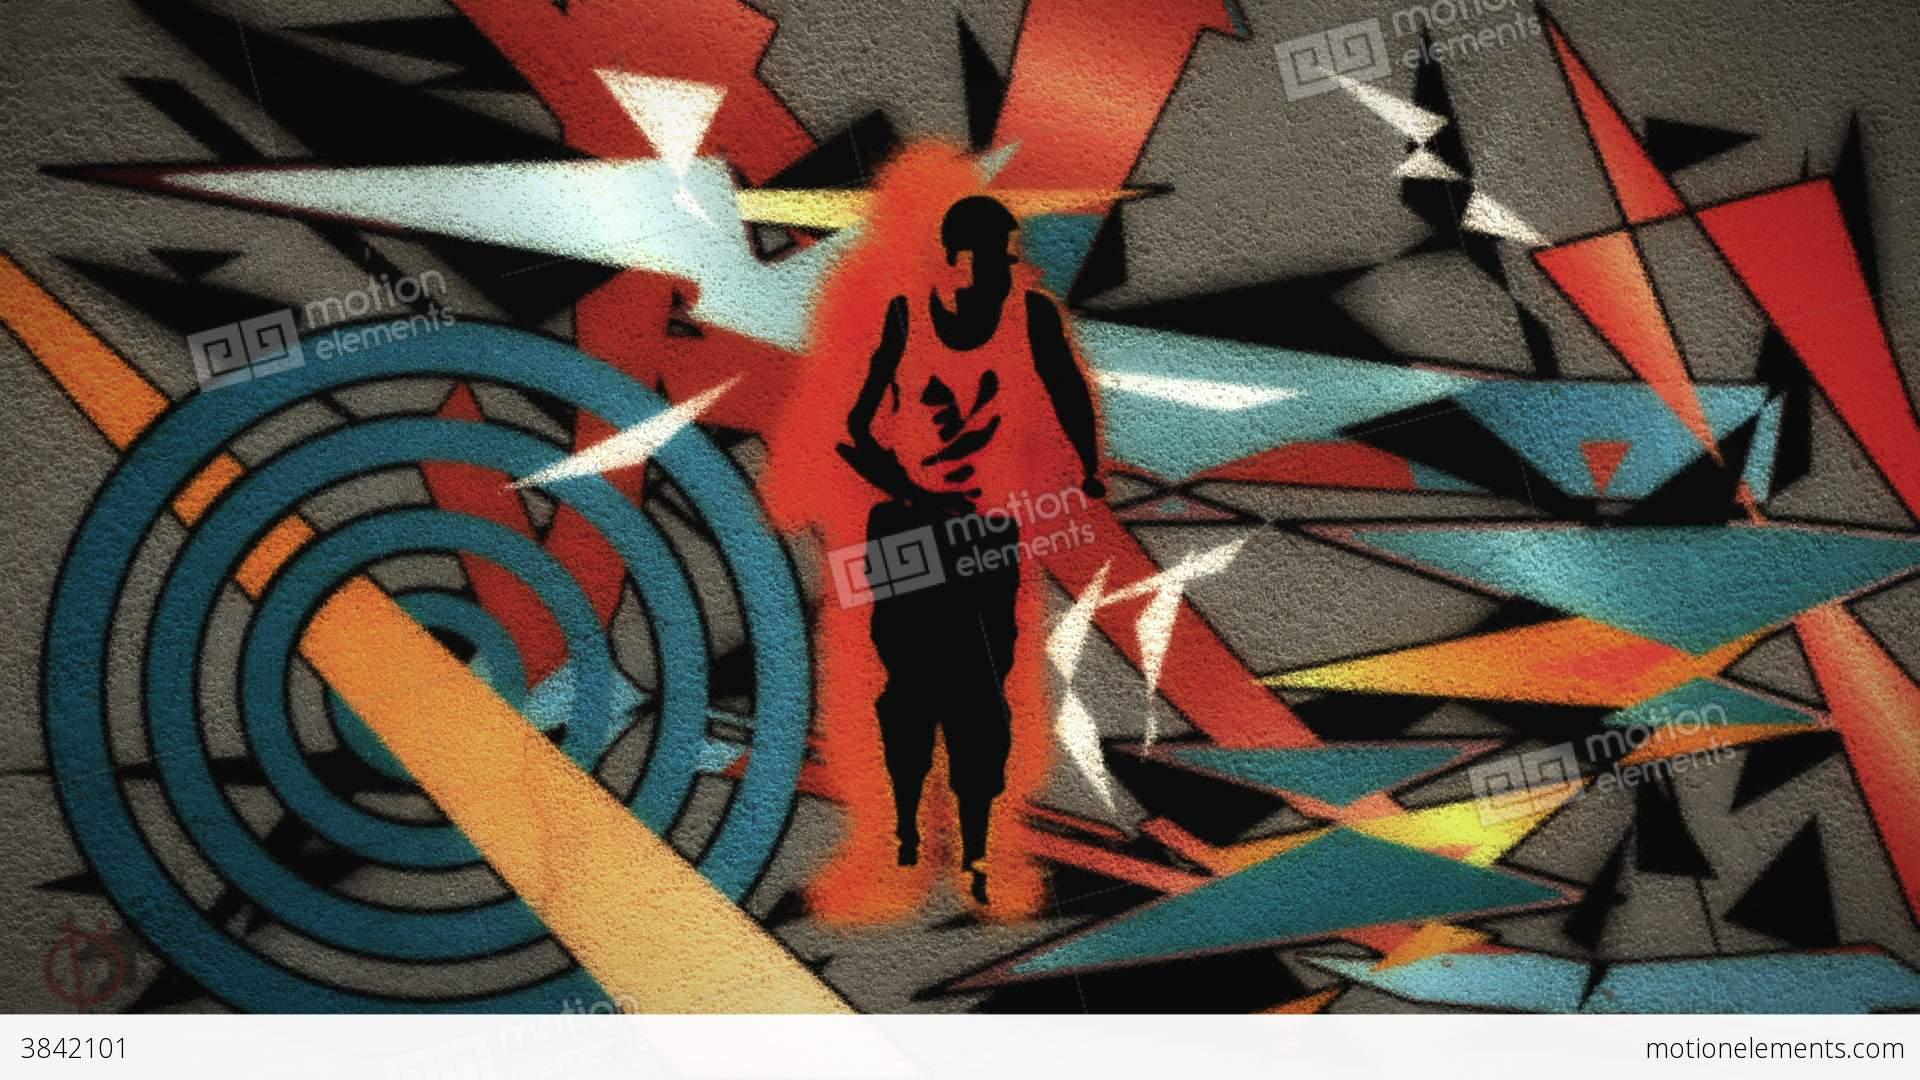 Graffiti Animation A Man Dances With Graffiti Spraying Onto The Wall Stock Animation